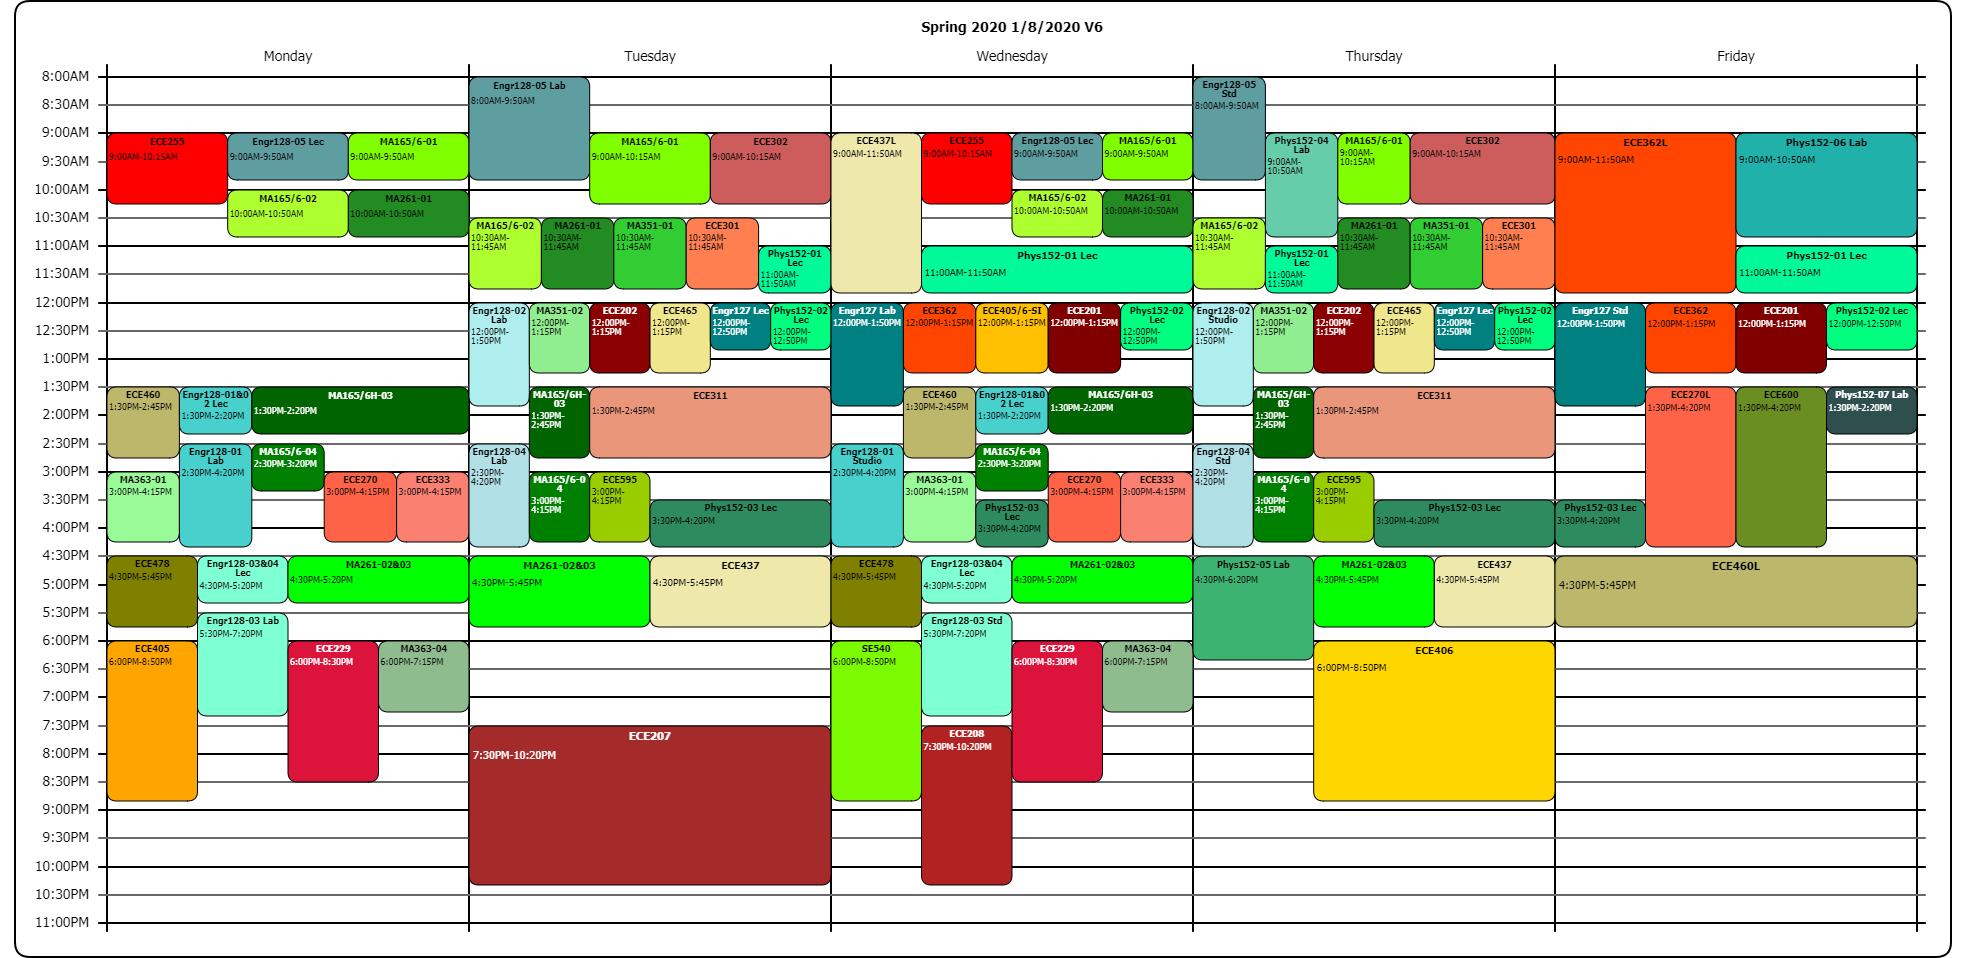 Purdue Fall 2022 Calendar.Ece Schedules Purdue University Fort Wayne